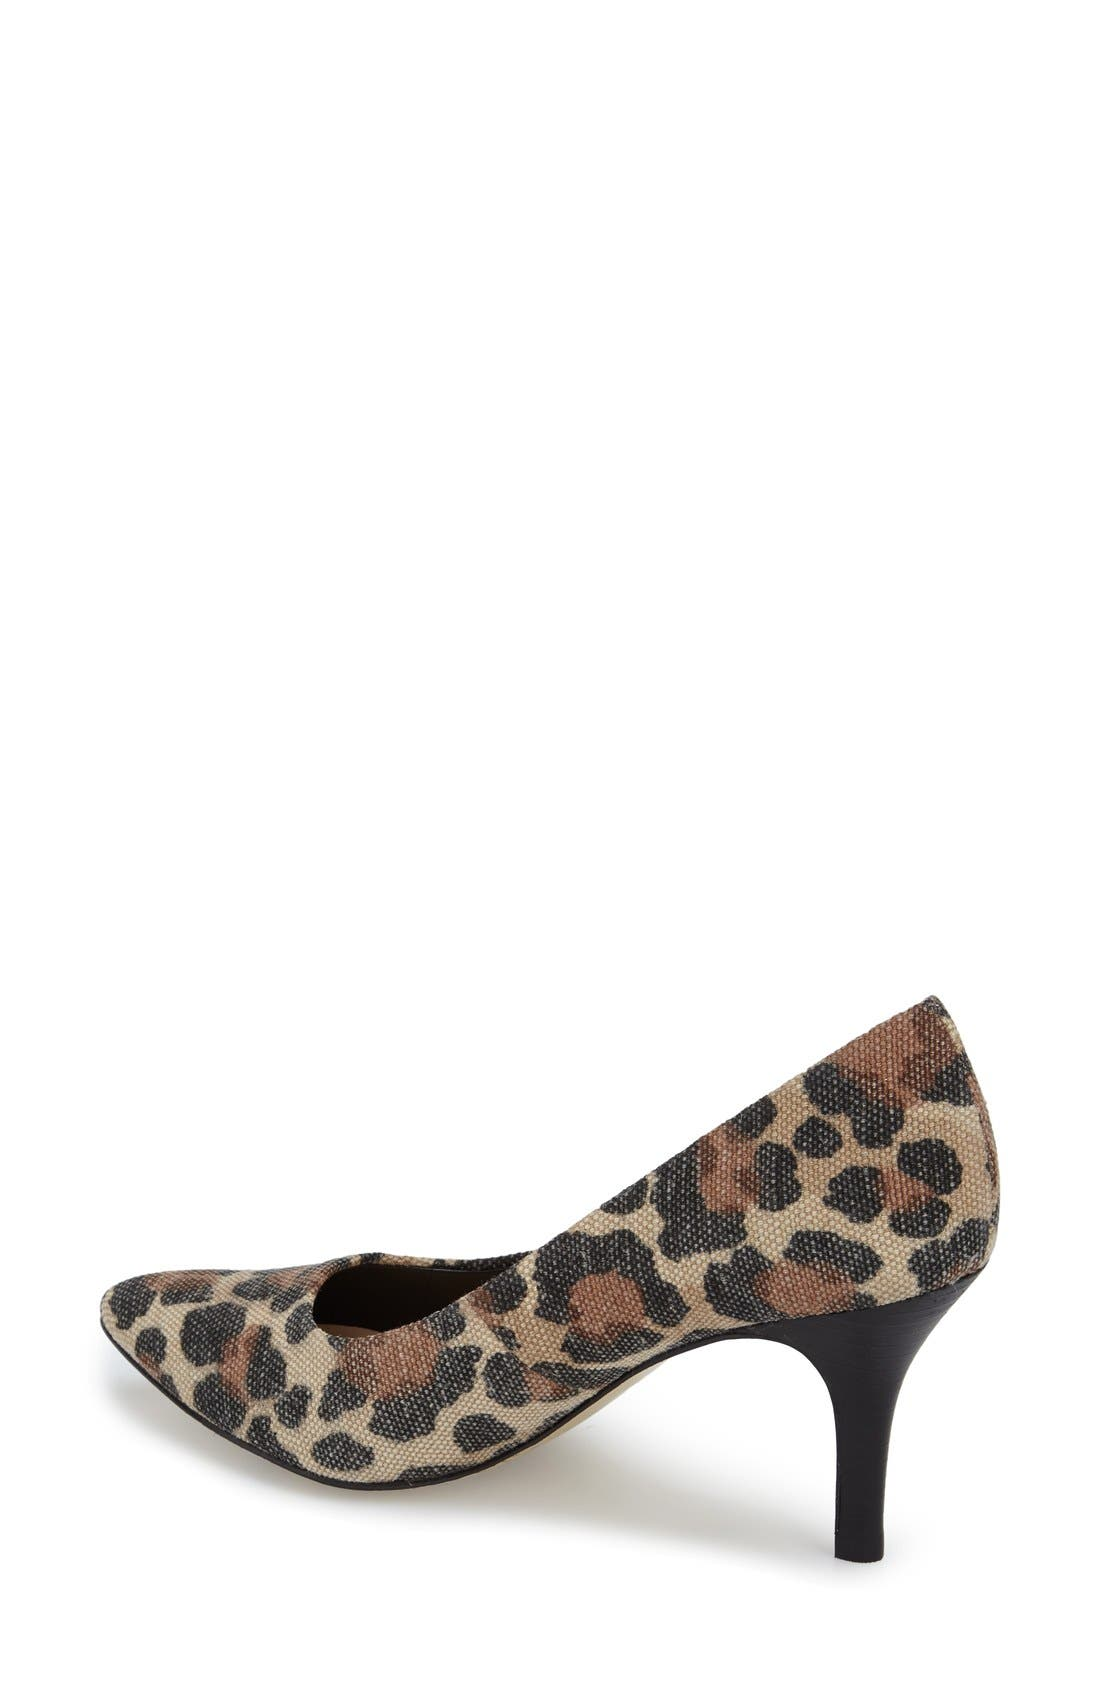 'Define' Pointy Toe Pump,                             Alternate thumbnail 2, color,                             Leopard